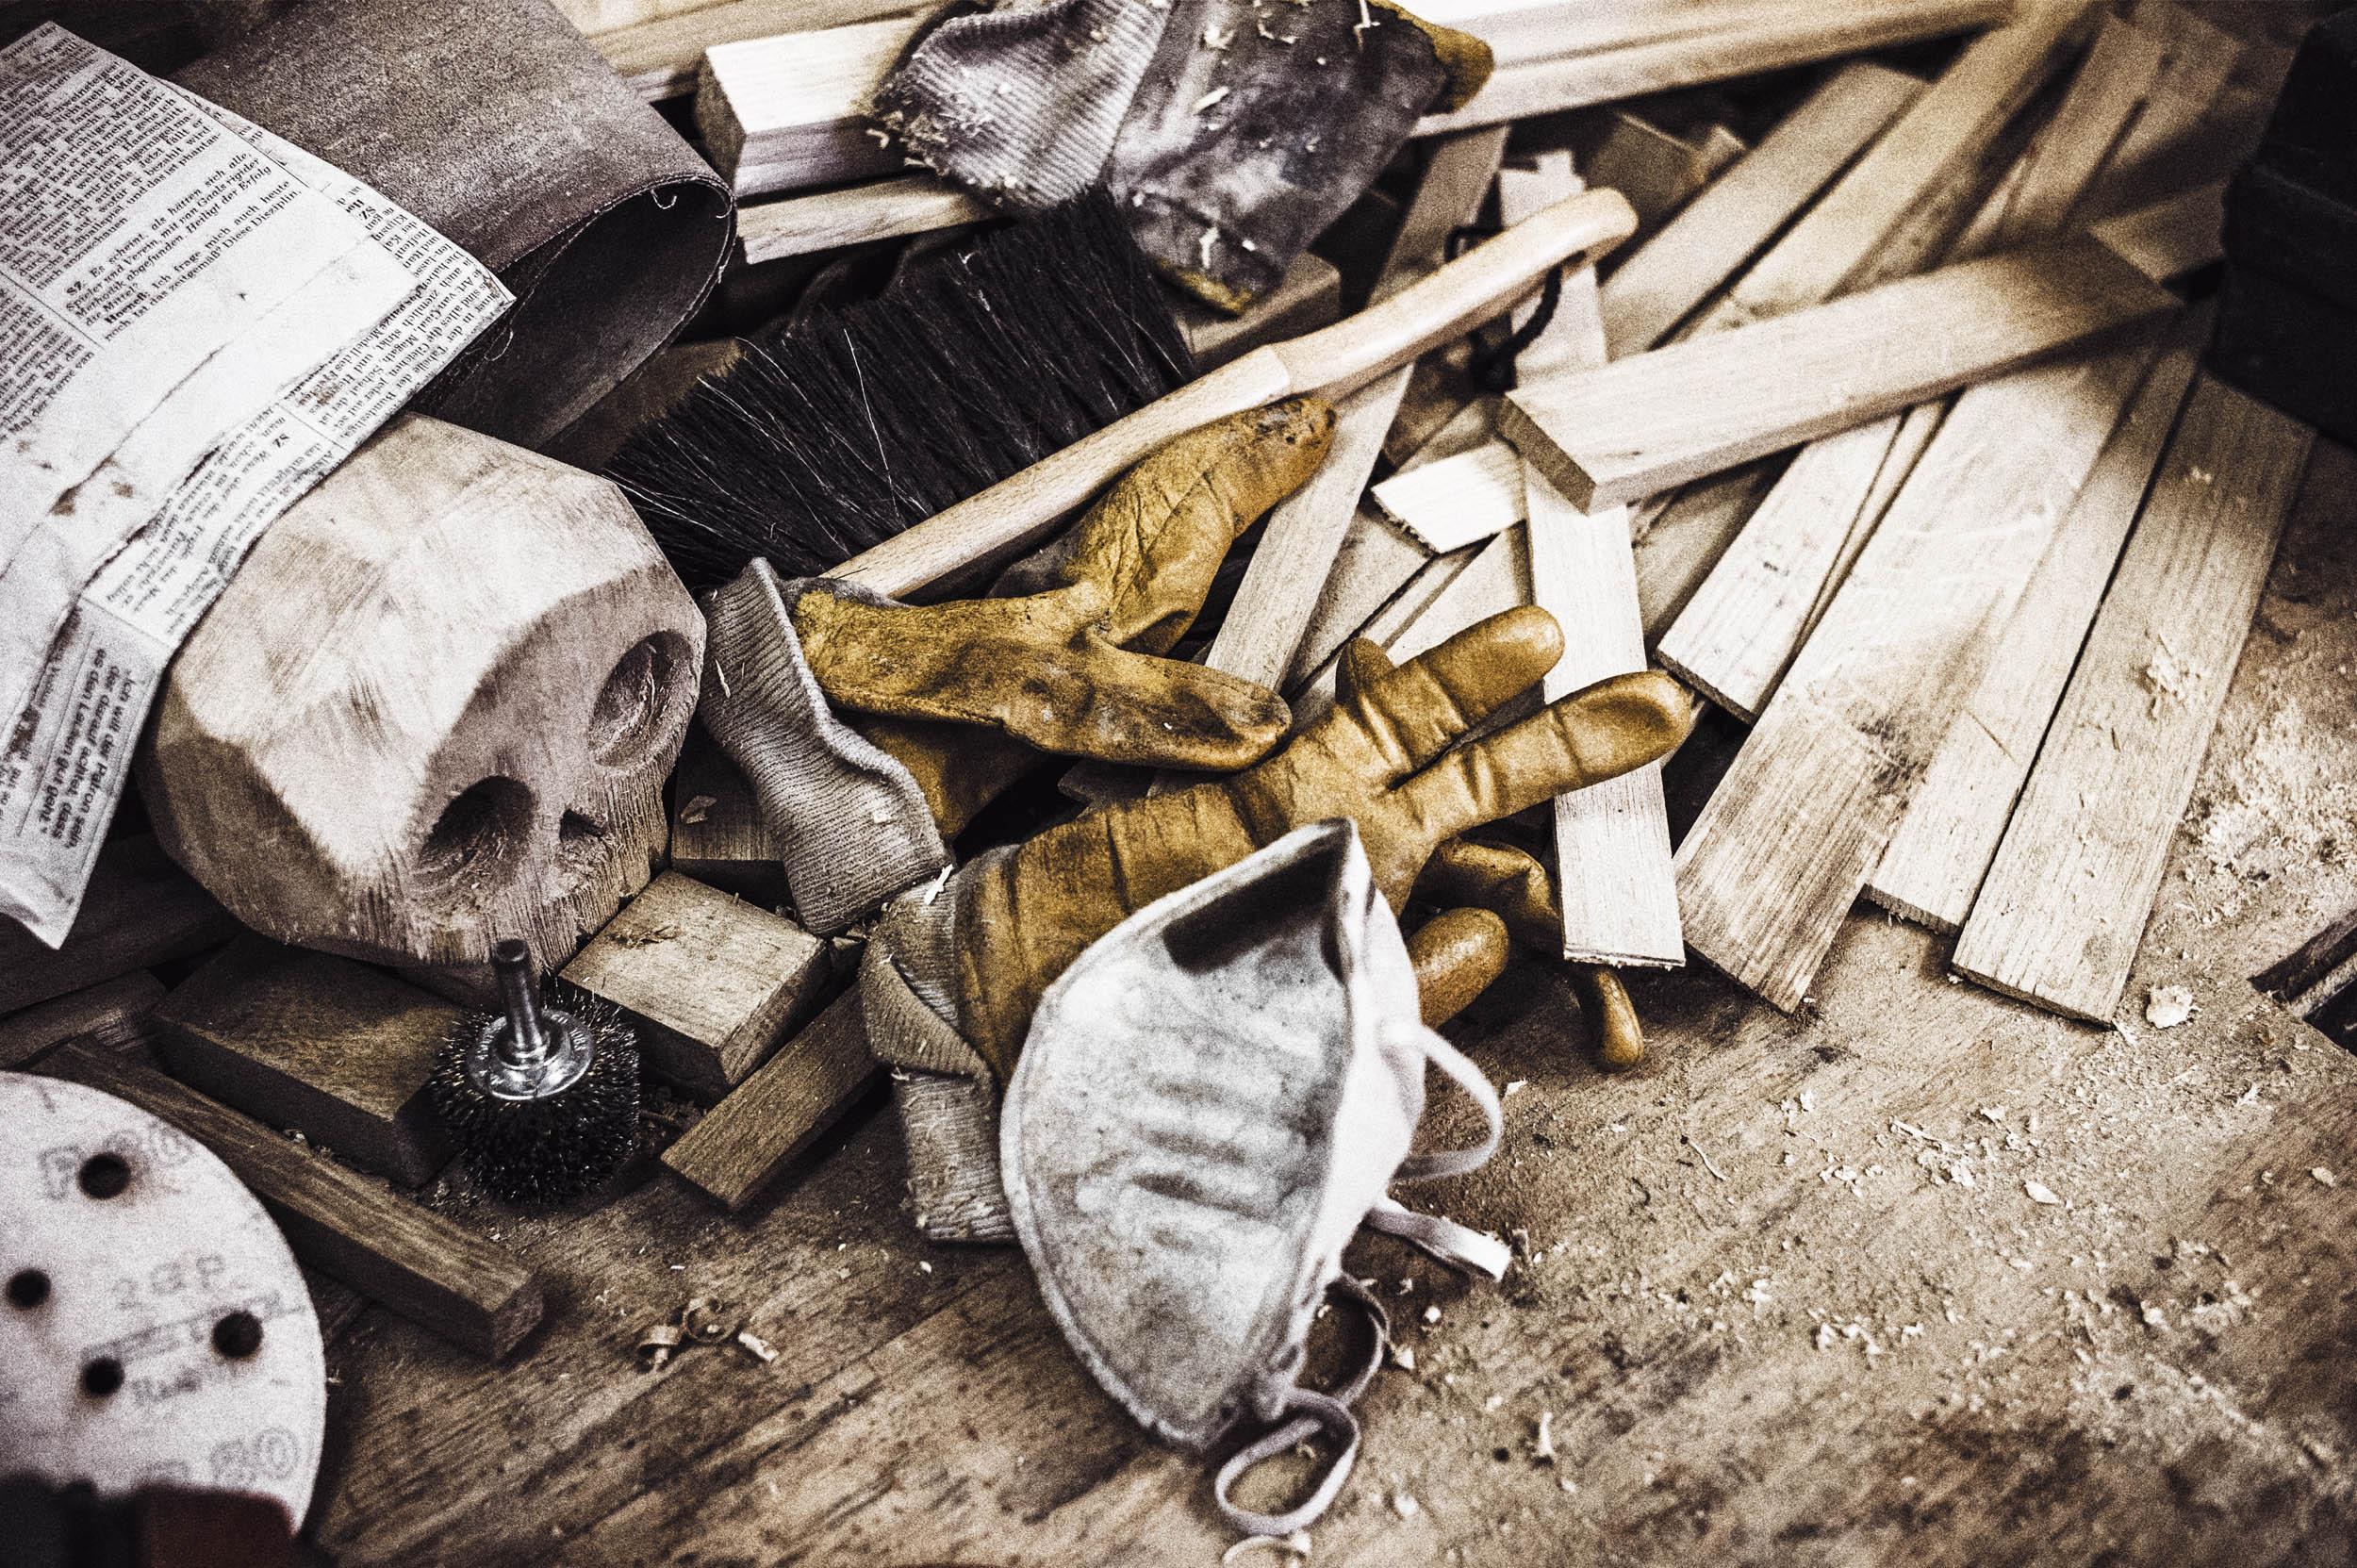 seifertuebler-corporate-handcraft-woodsculpture-vogel-10.jpg